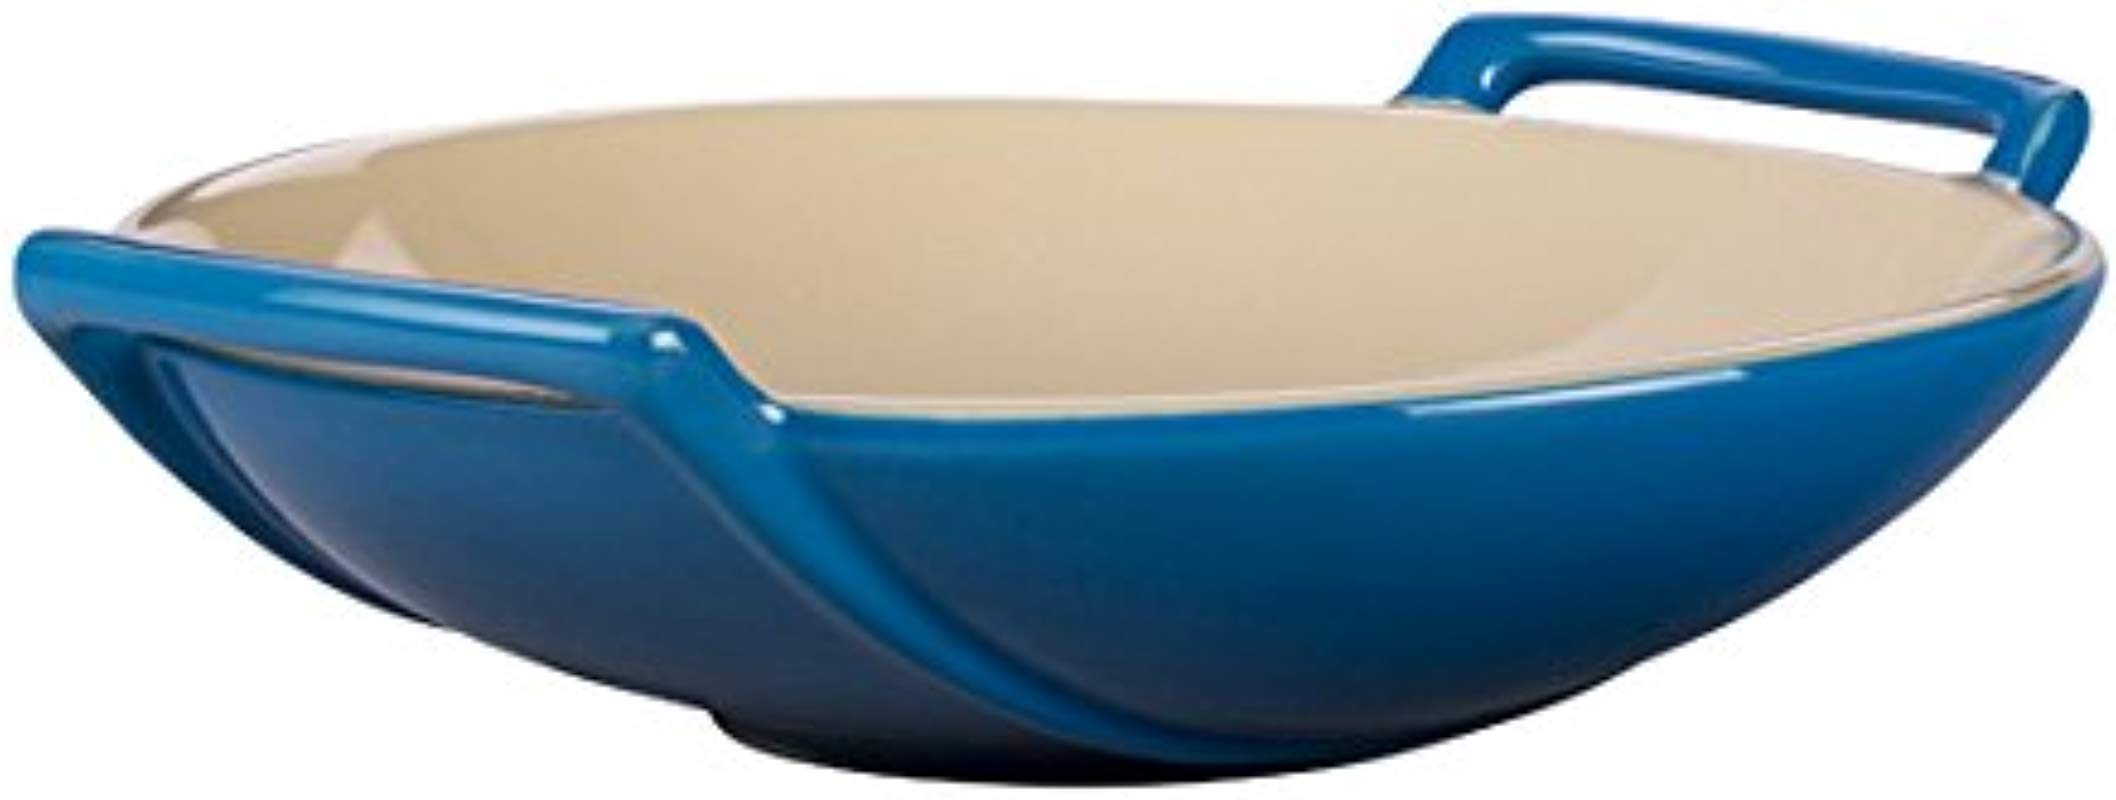 Le Creuset Stoneware Wok Dish 28 Ounce Marseille